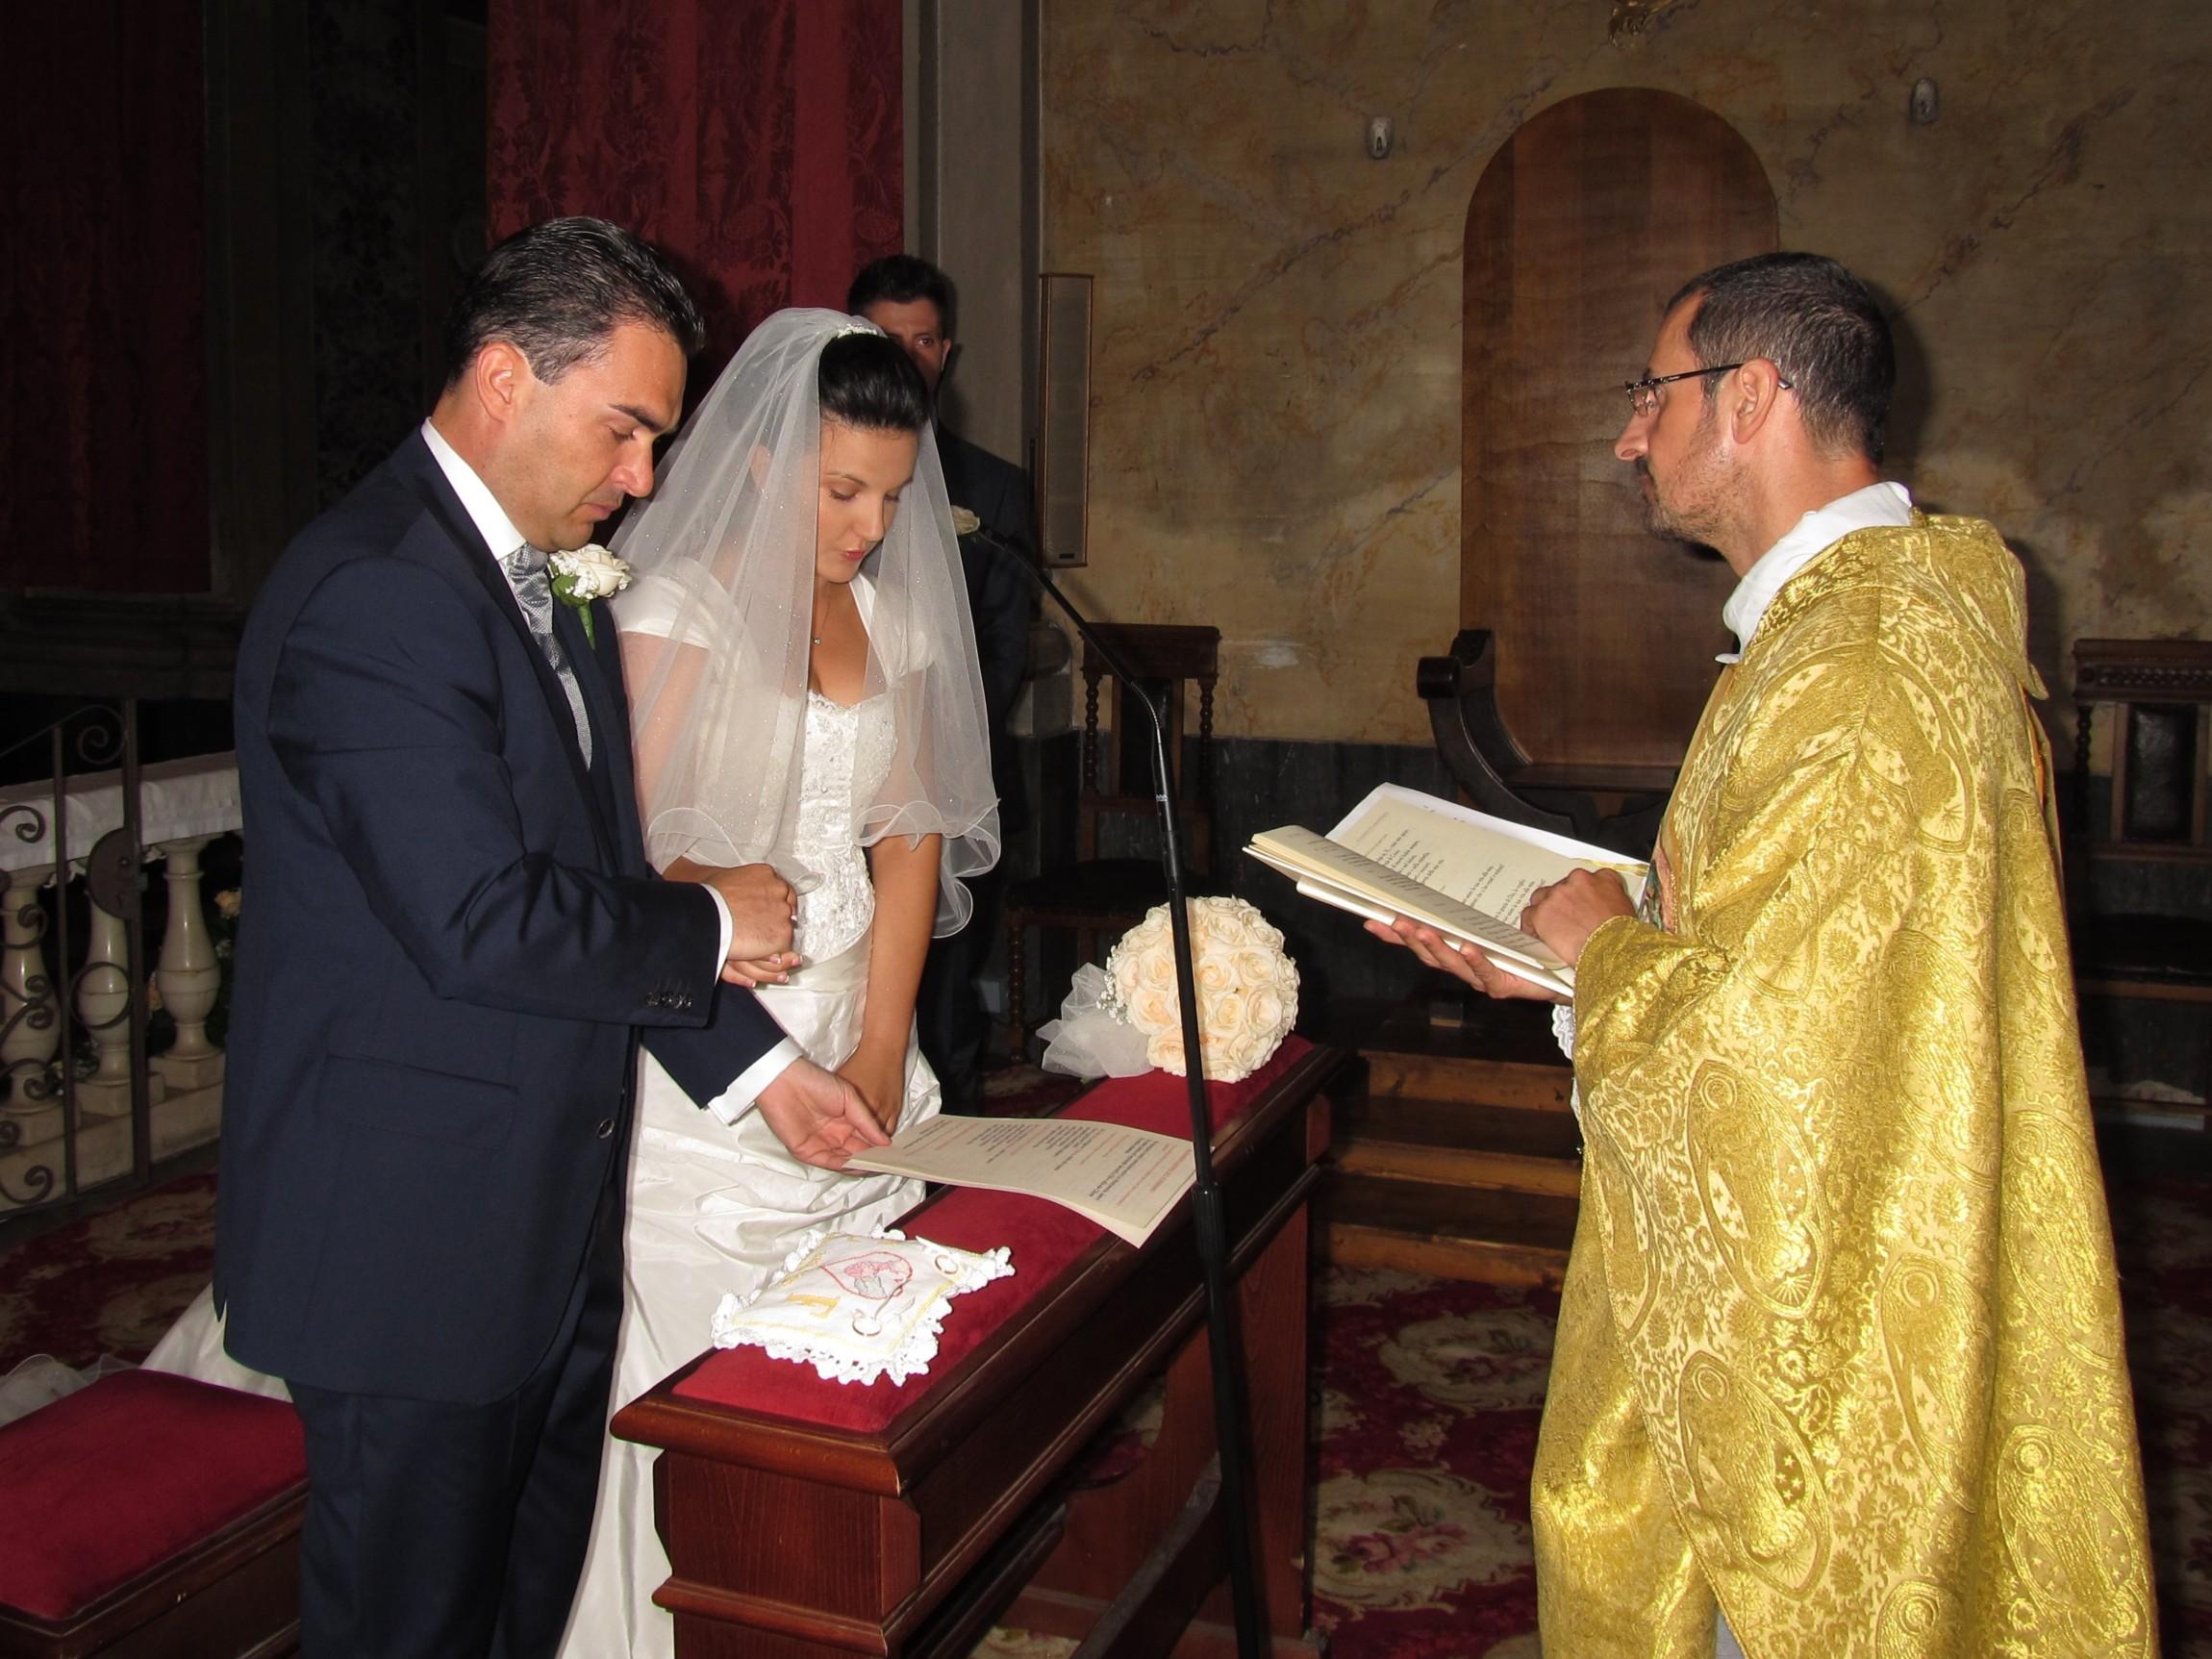 matrimonio_piccardo_franzi_2014-07-19-11-33-07